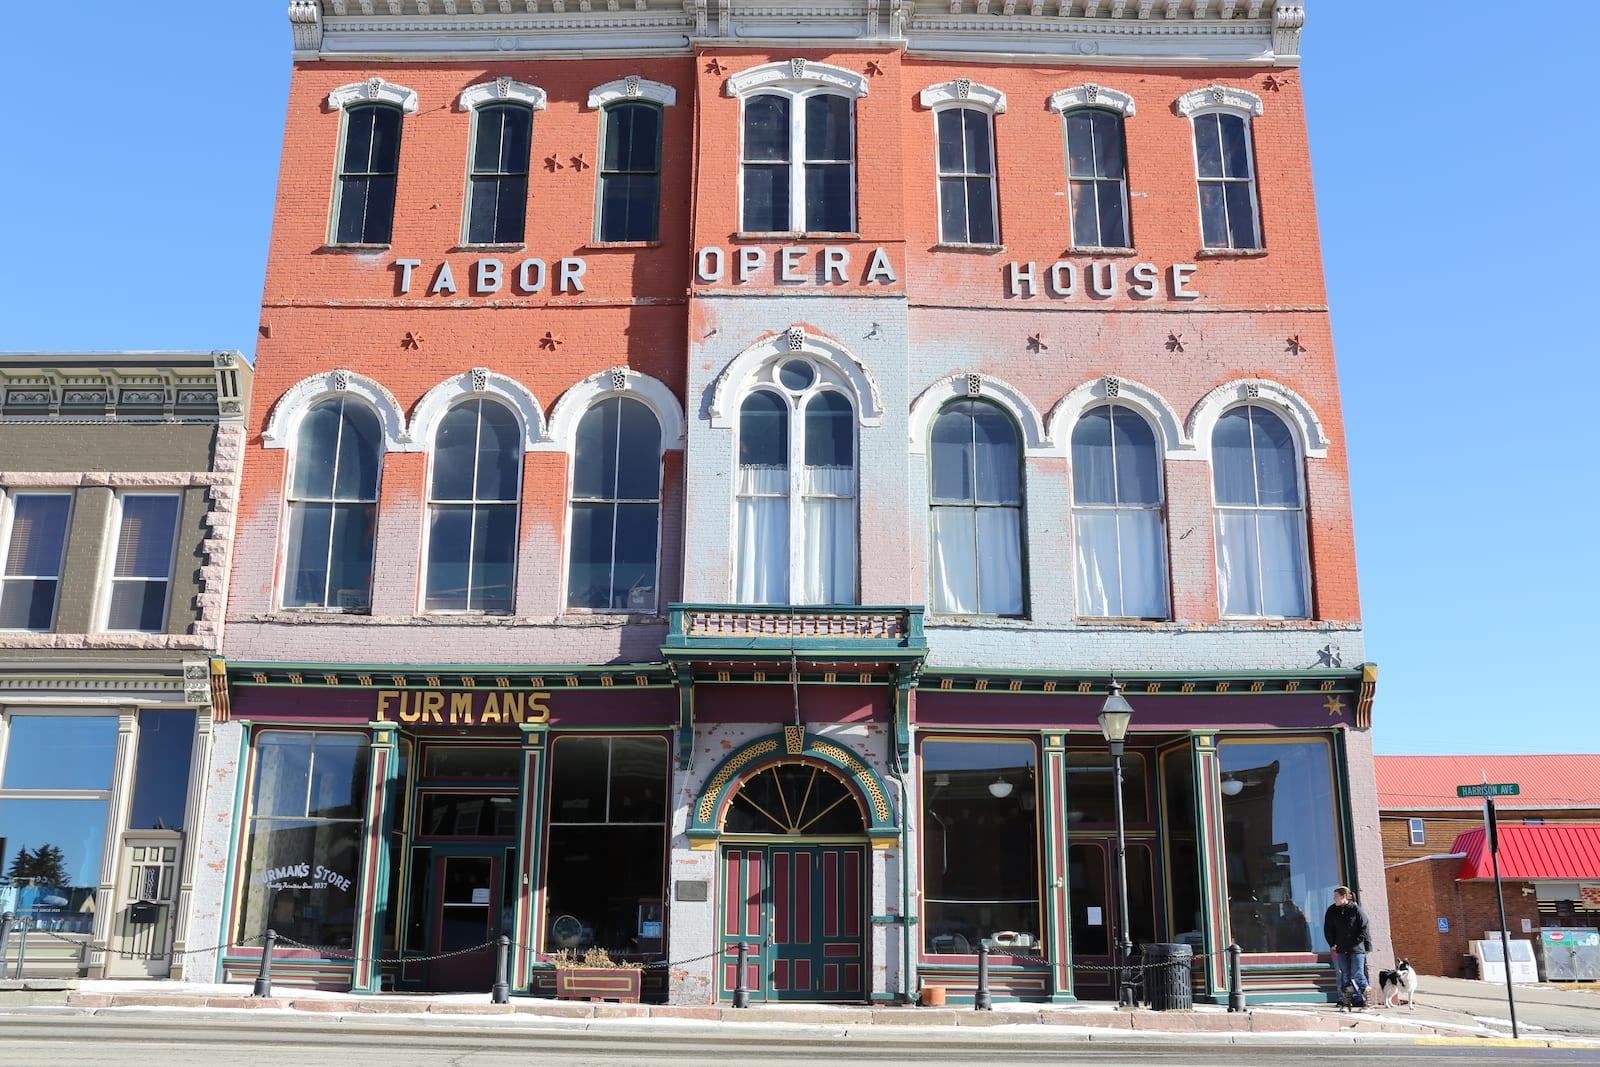 Tabor Opera House Leadville CO